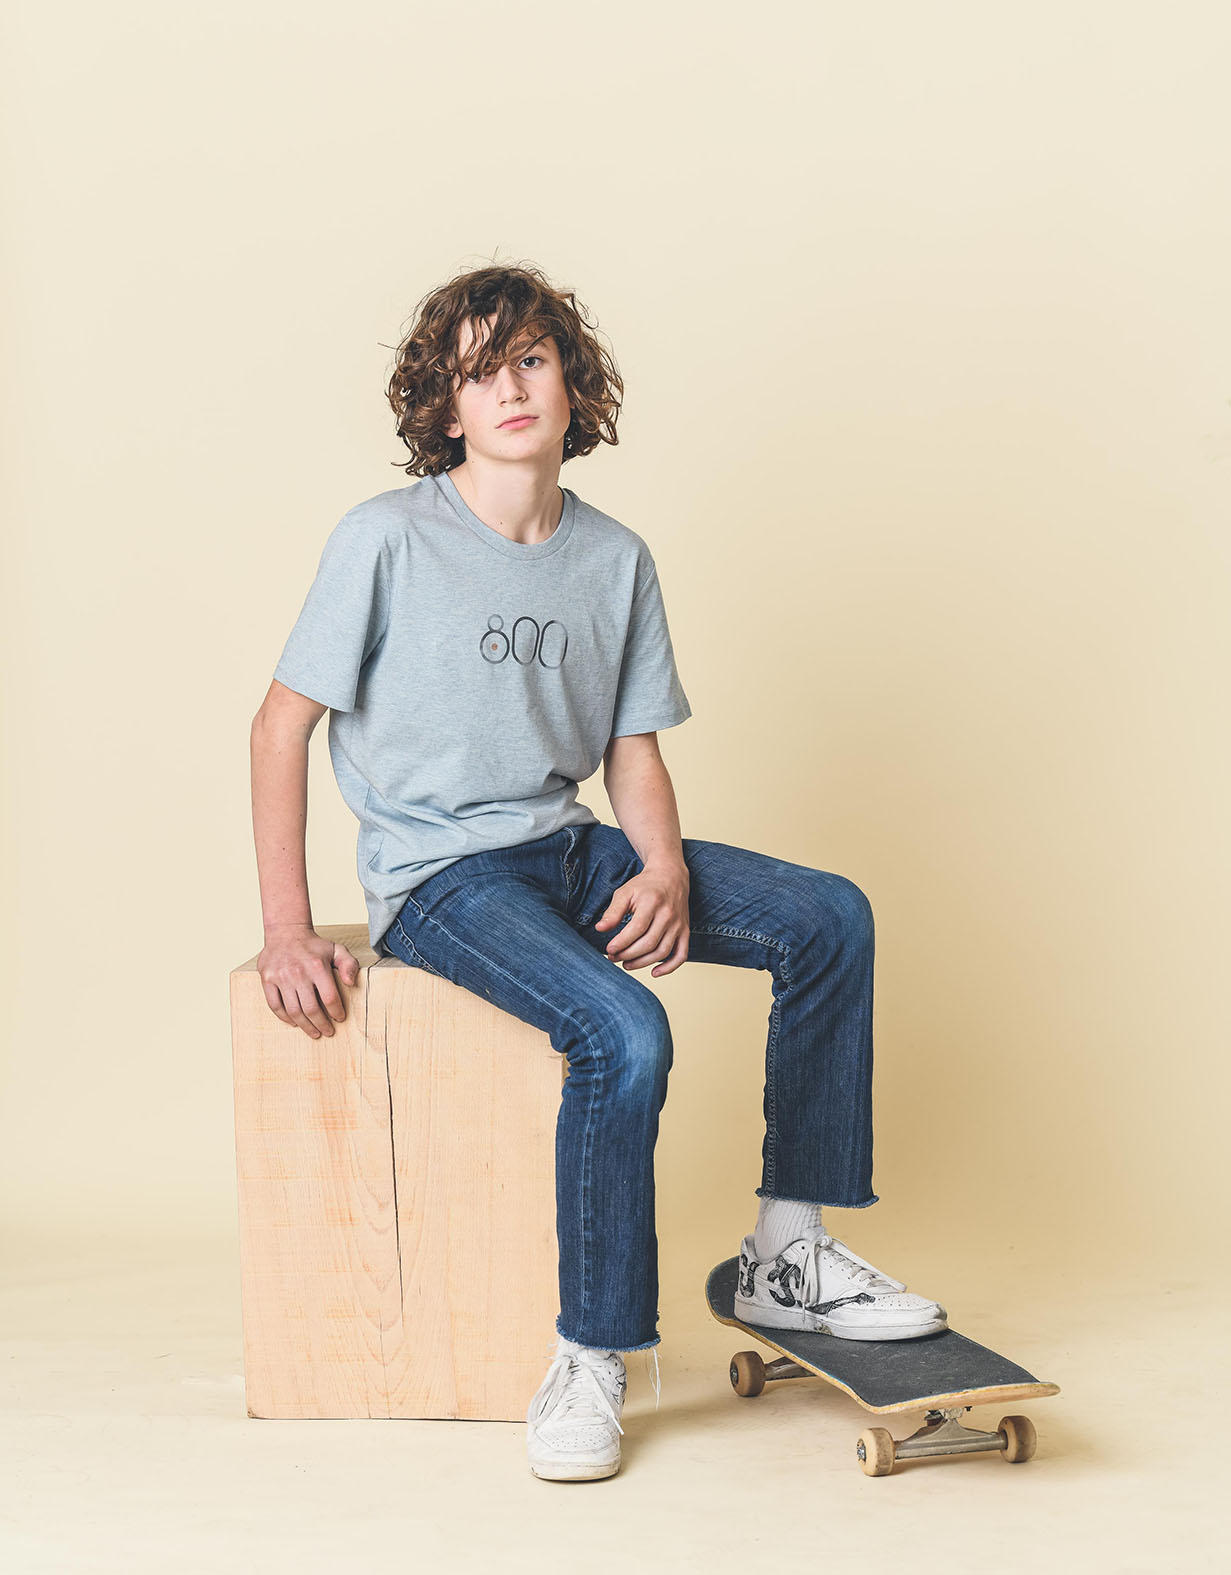 Laurent-scavone-photographe-mode-studio-lille-19